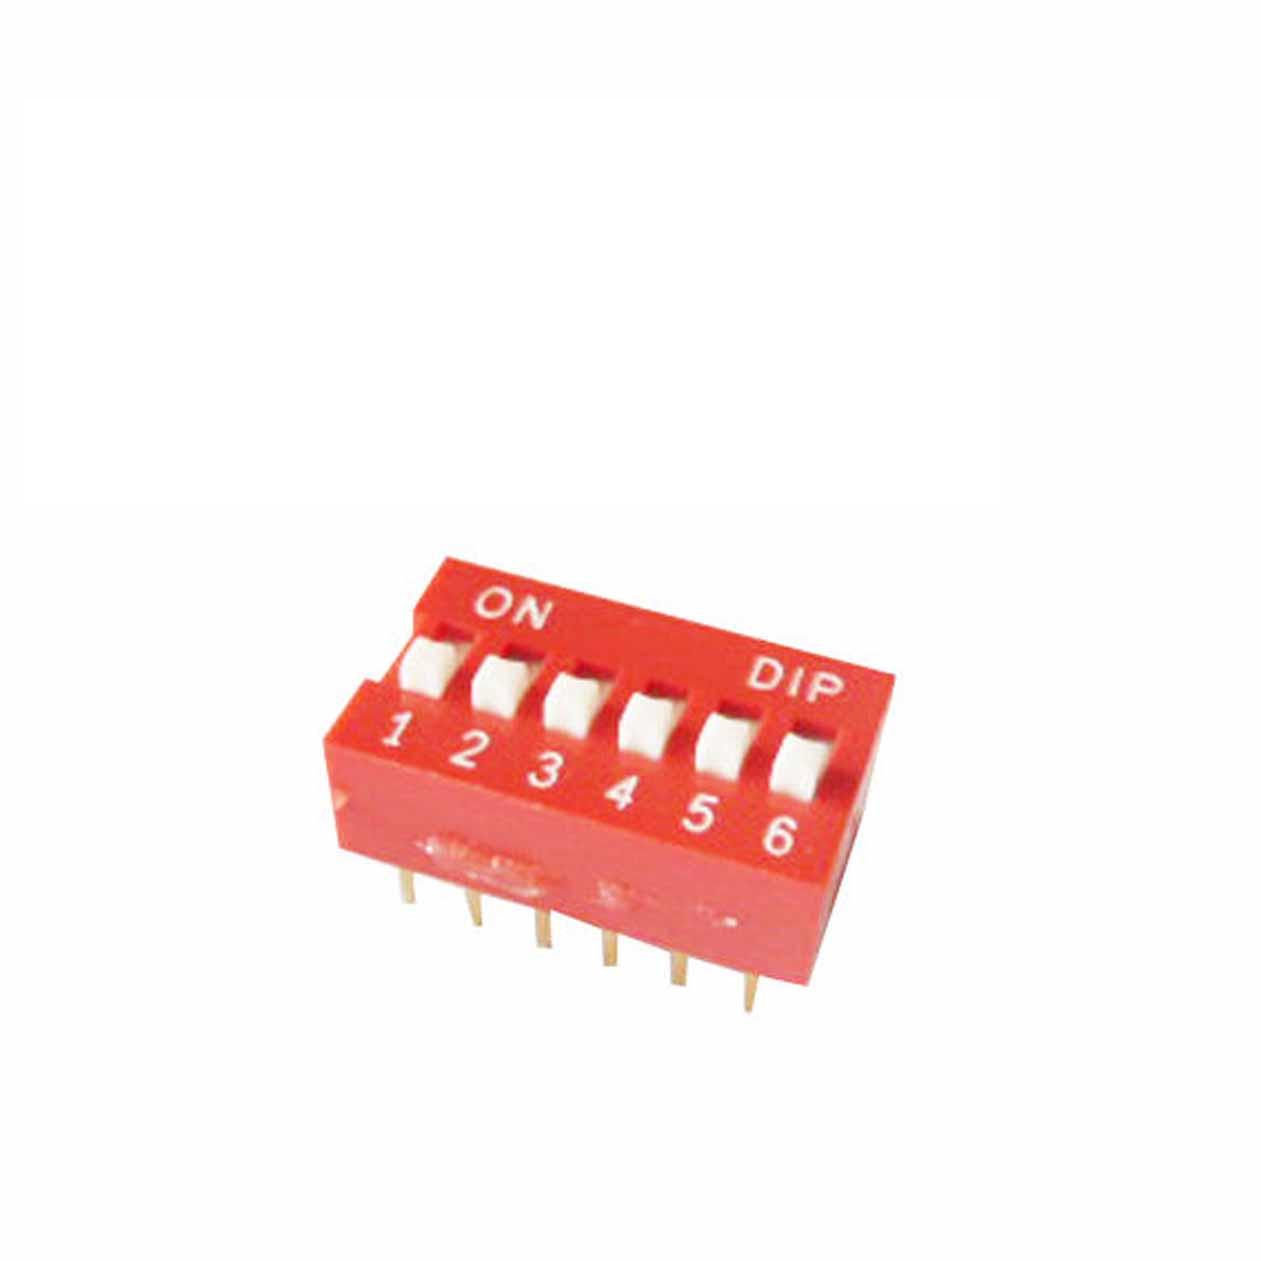 cong-tac-bit-6p-2-54mm